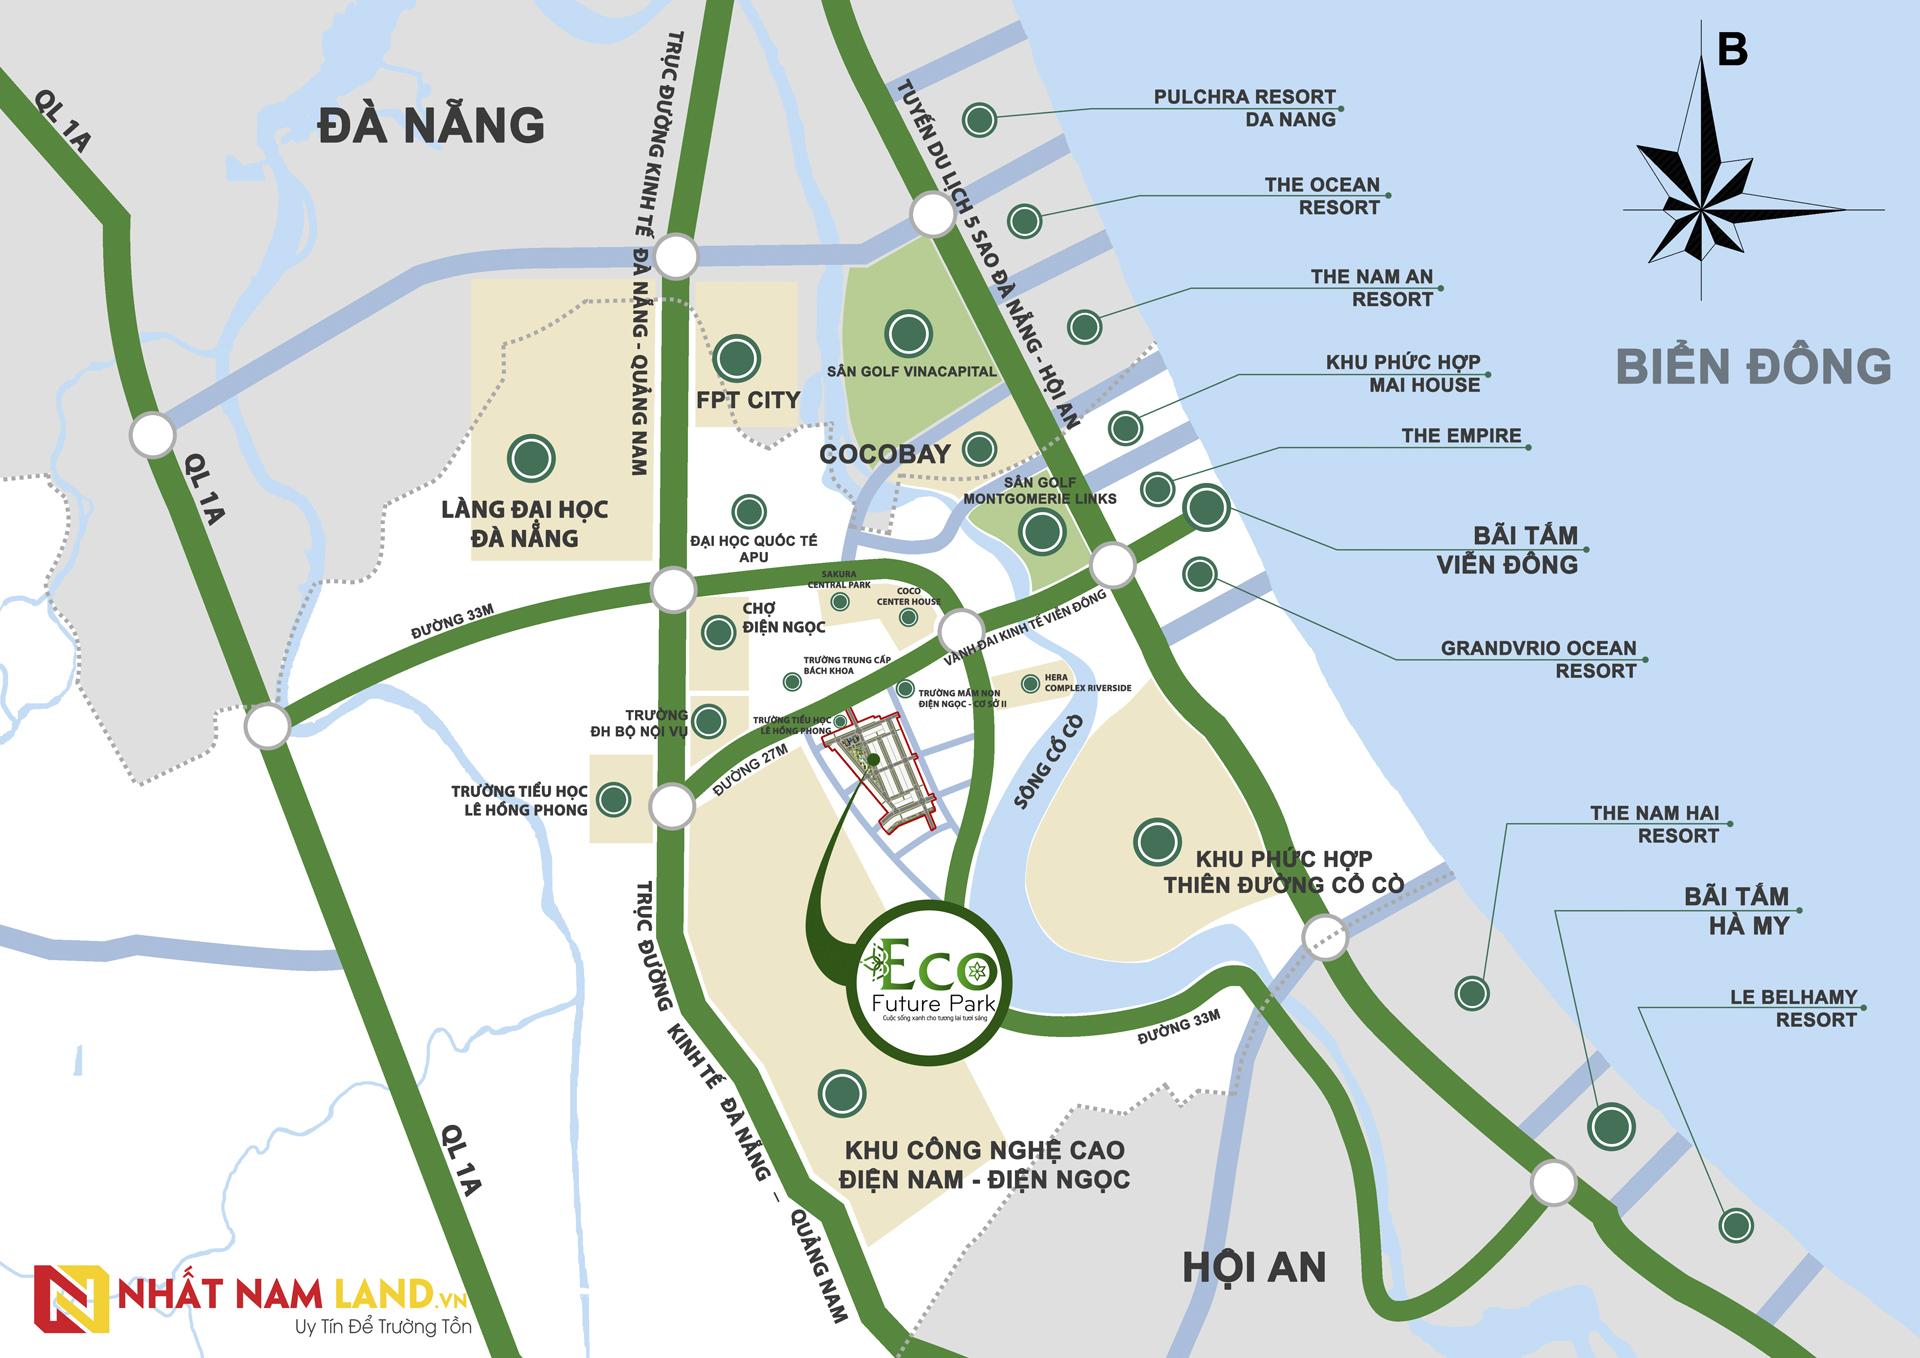 Sơ đồ vị trí dự án Eco Future Park